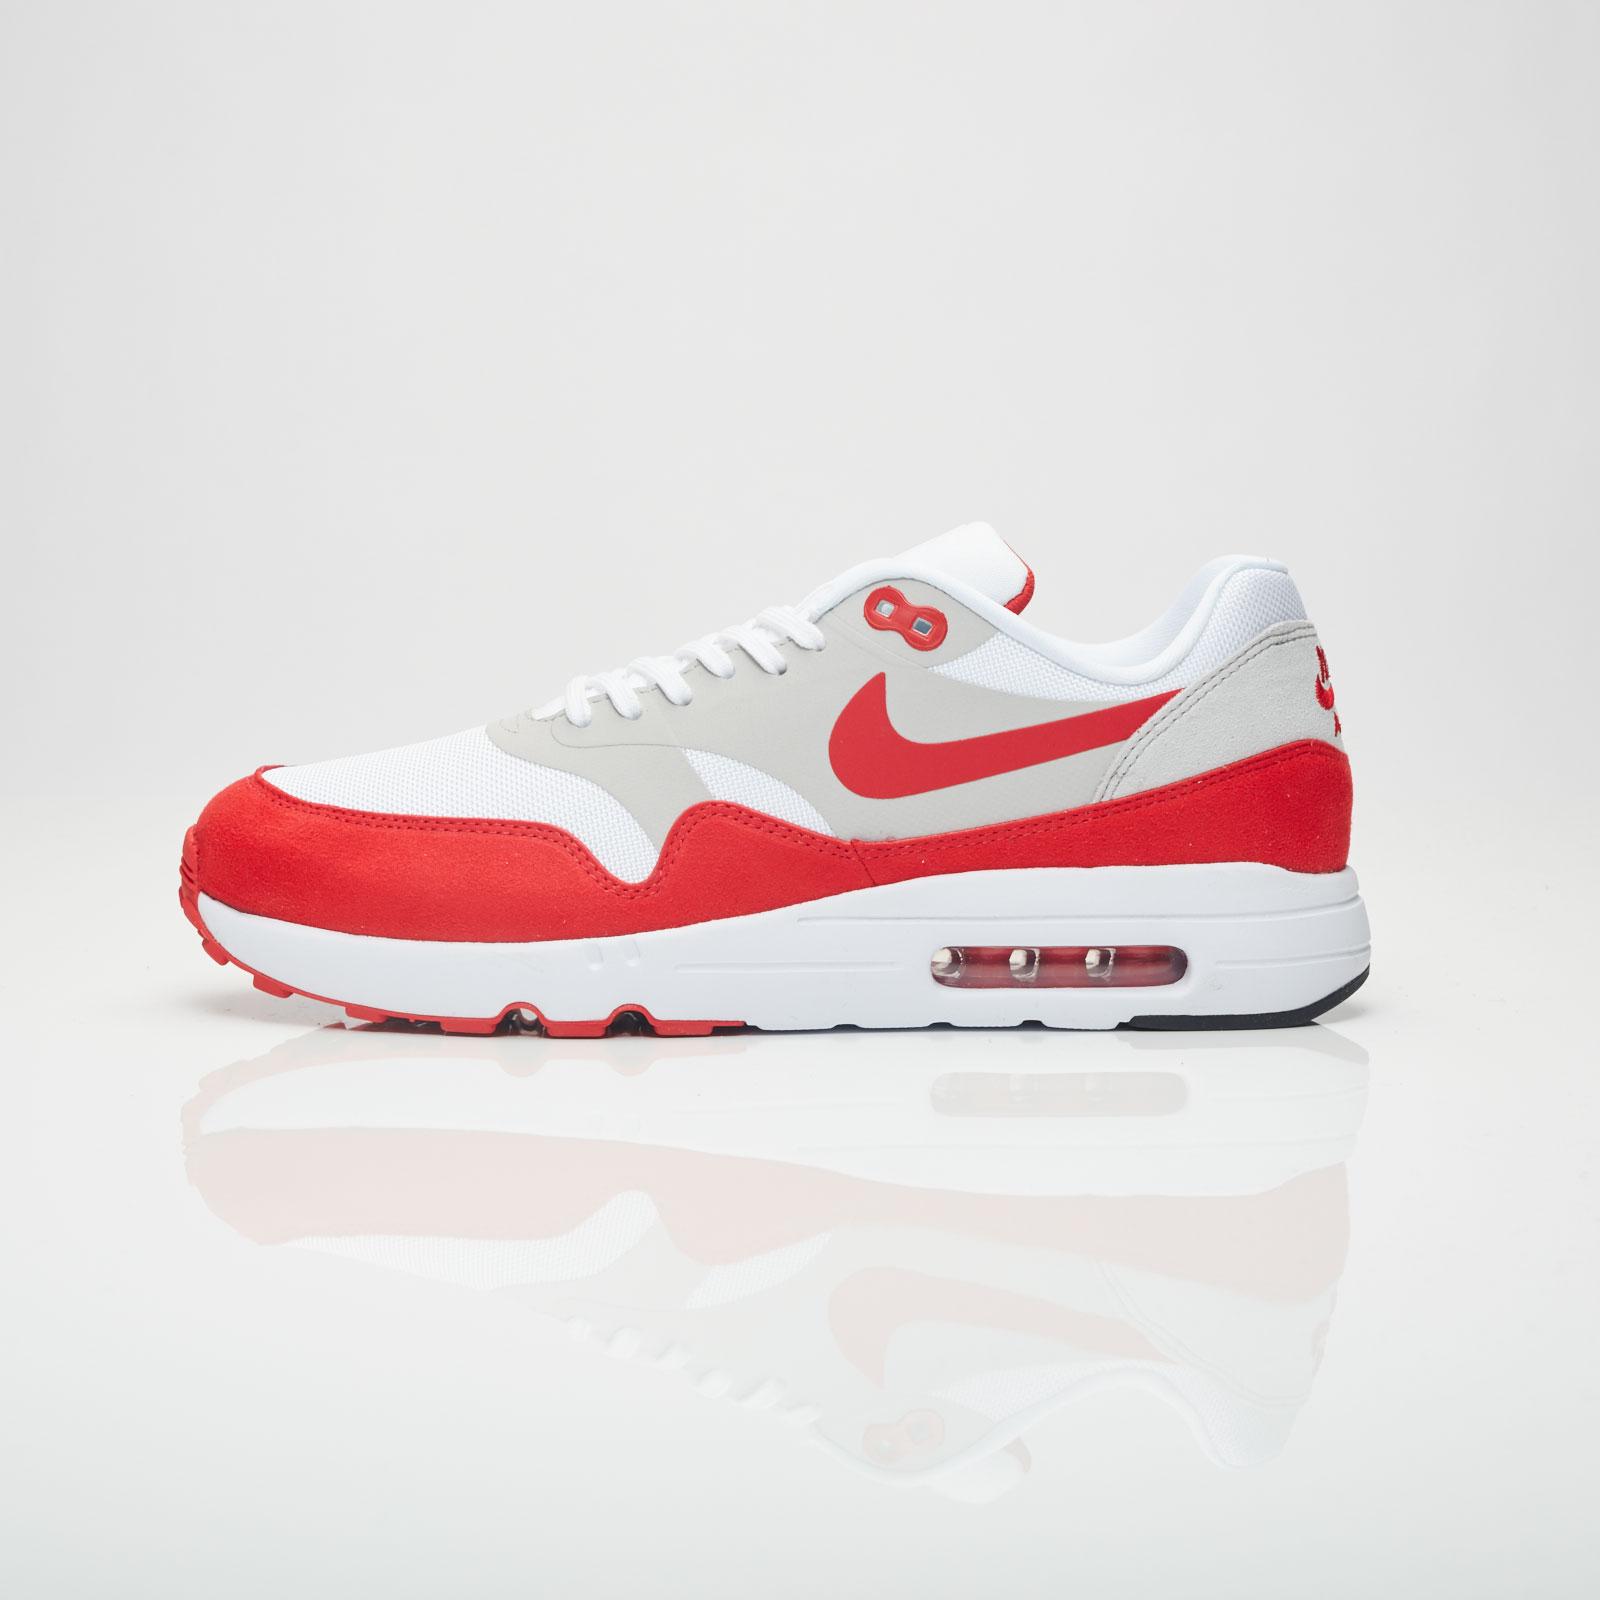 pretty nice 40c37 848a3 Nike Air Max 1 Ultra 2.0 Le - 908091-100 - Sneakersnstuff   sneakers    streetwear online since 1999